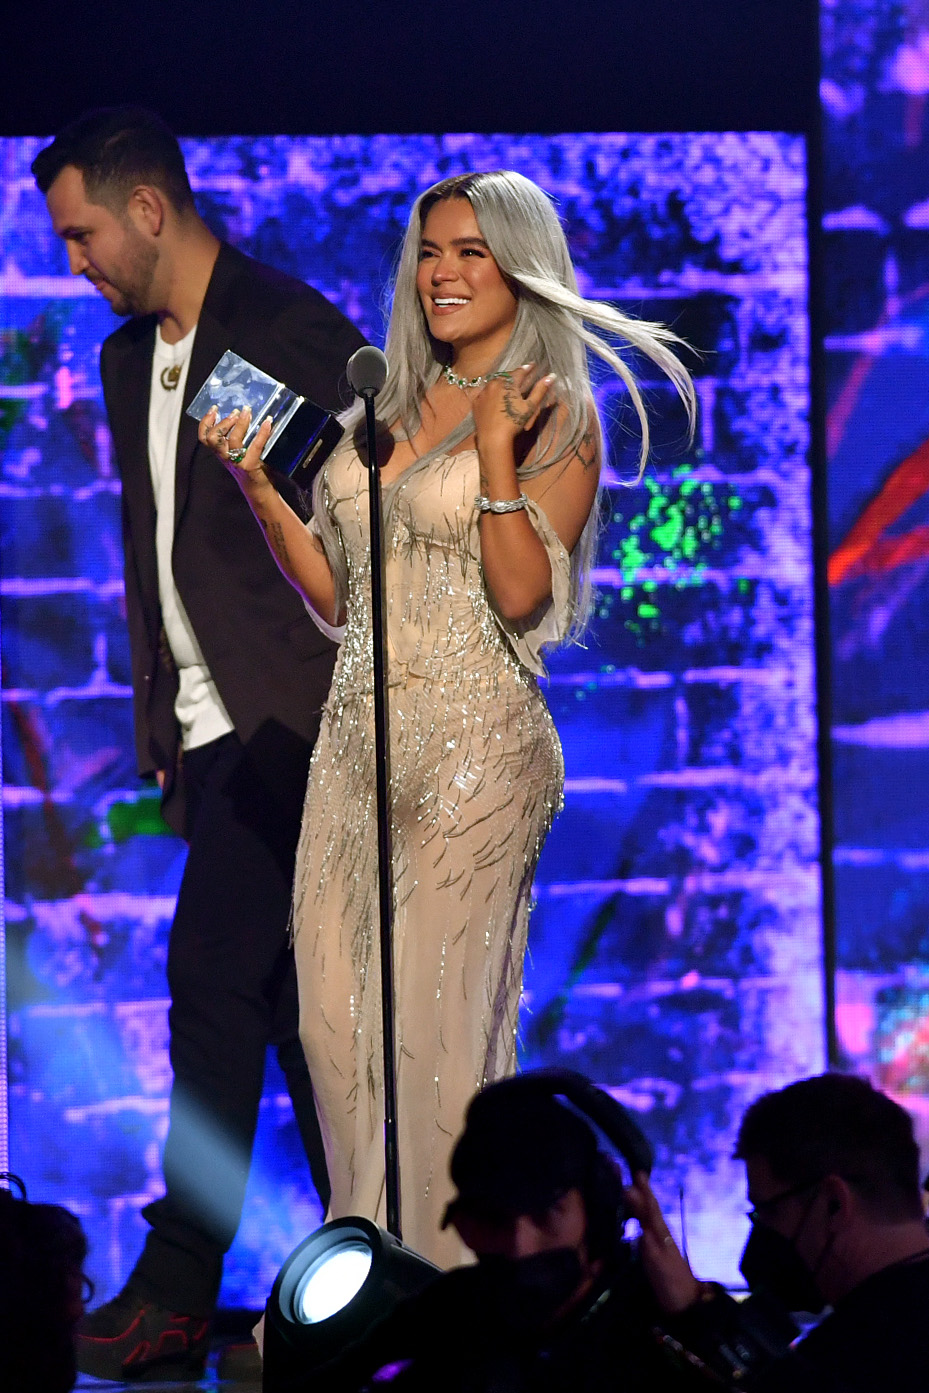 Karol G accepts the award for #1 Artista de la Juventud Femenina onstage at Premios Juventud 2021